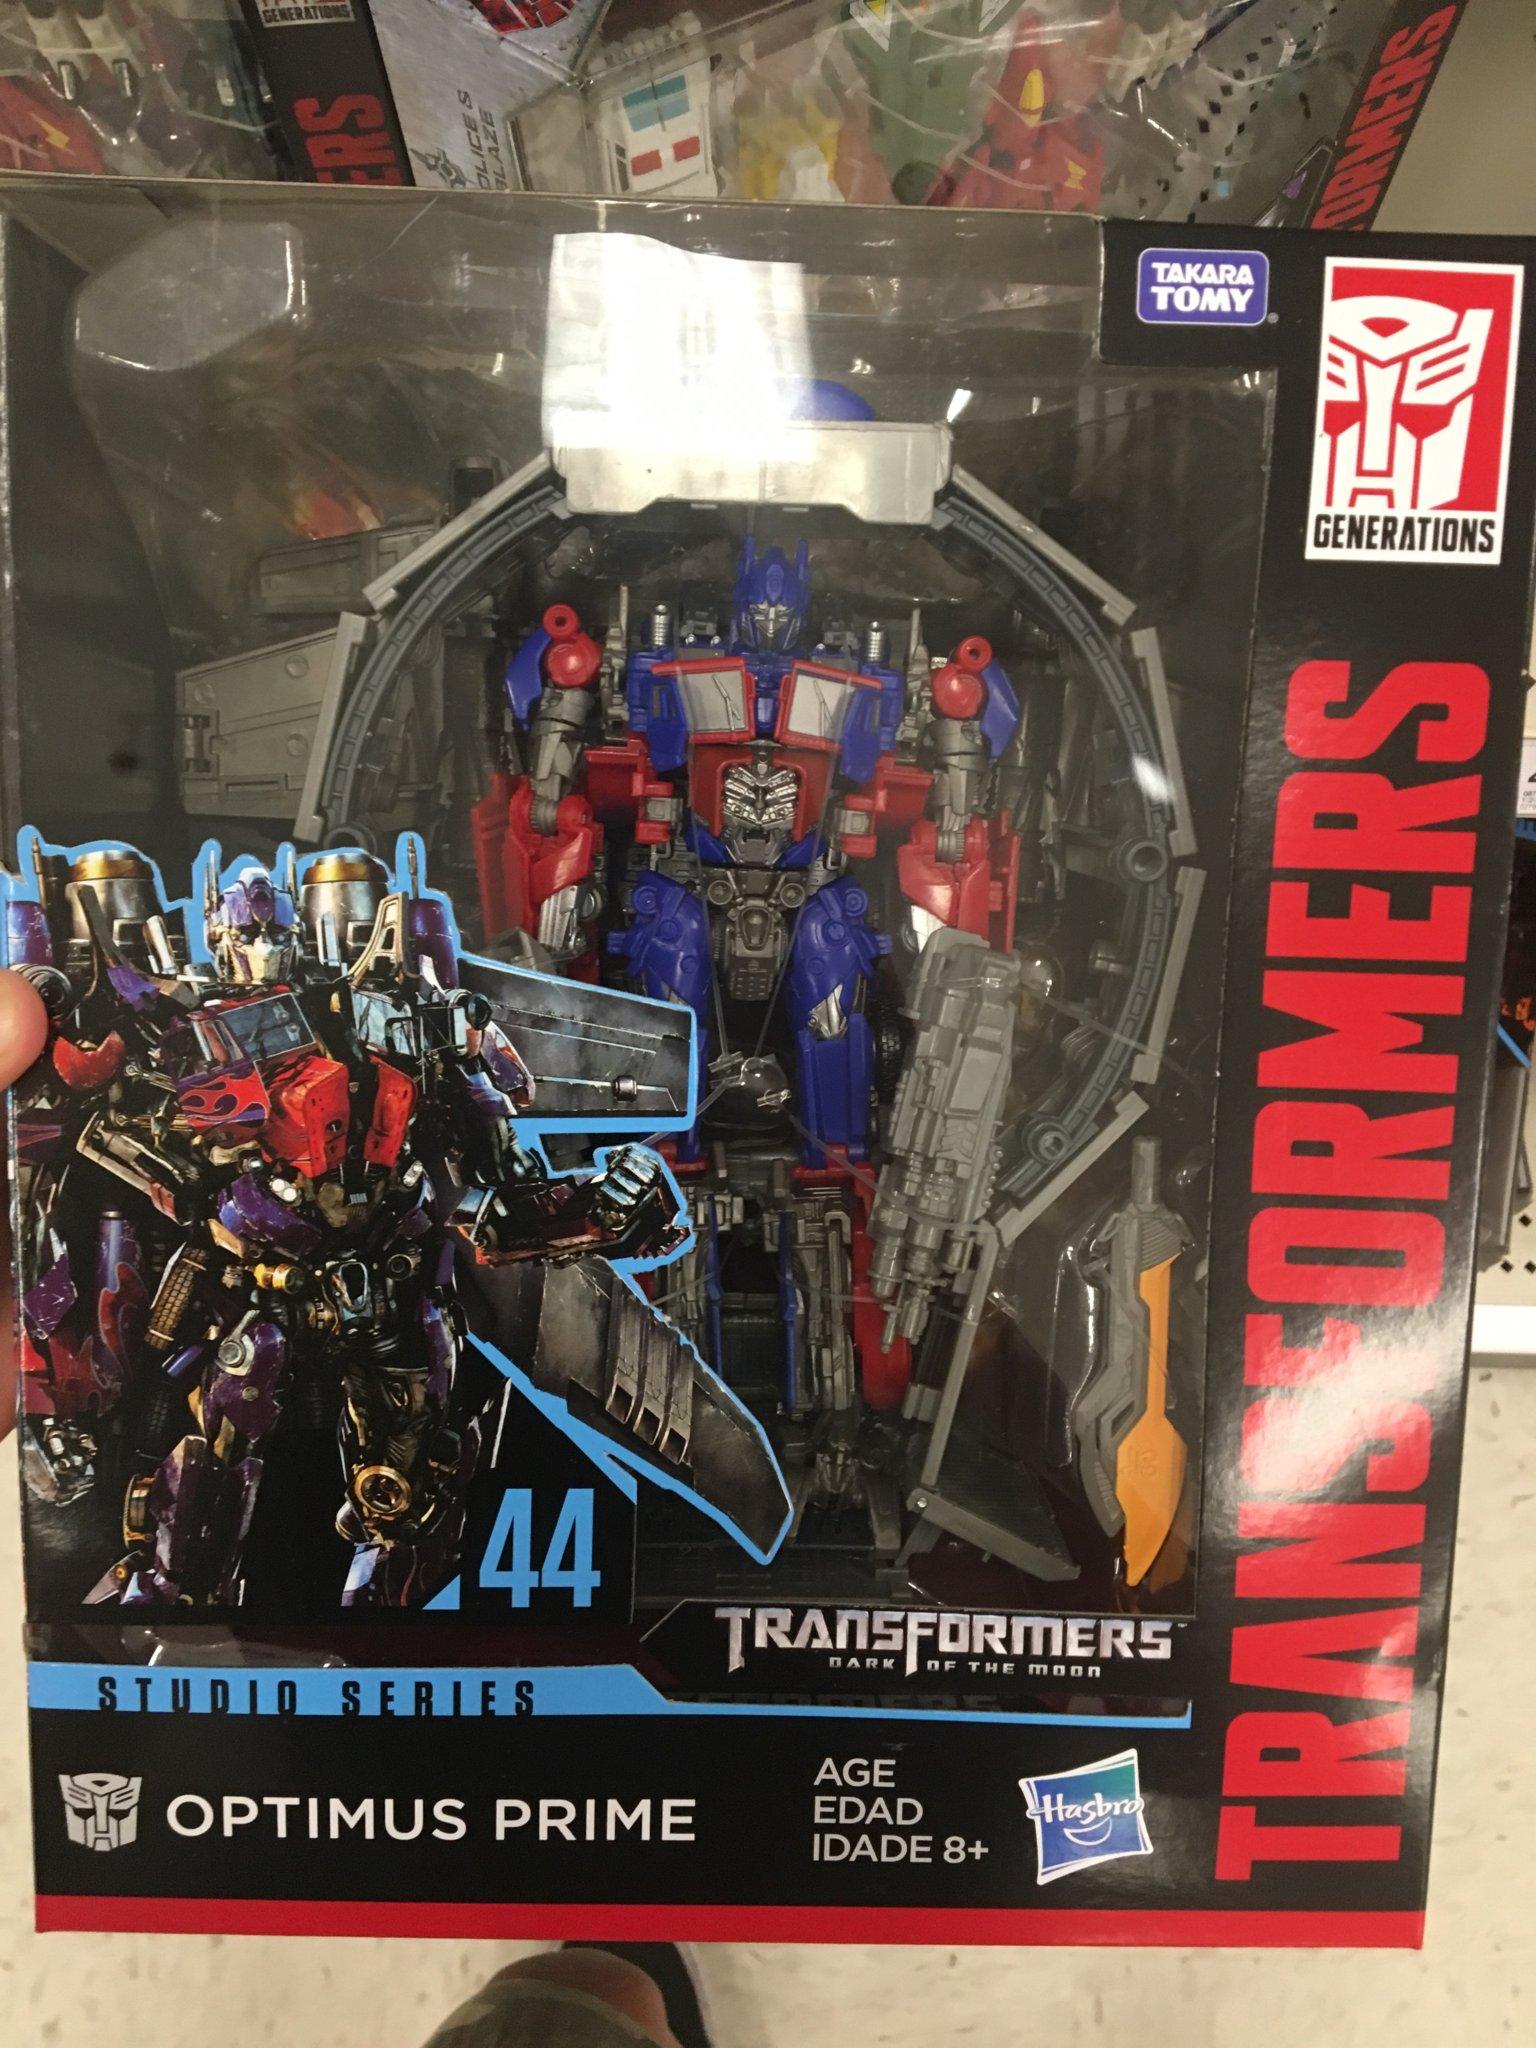 Transformers Studio Serie 44 Leader Optimus Prime